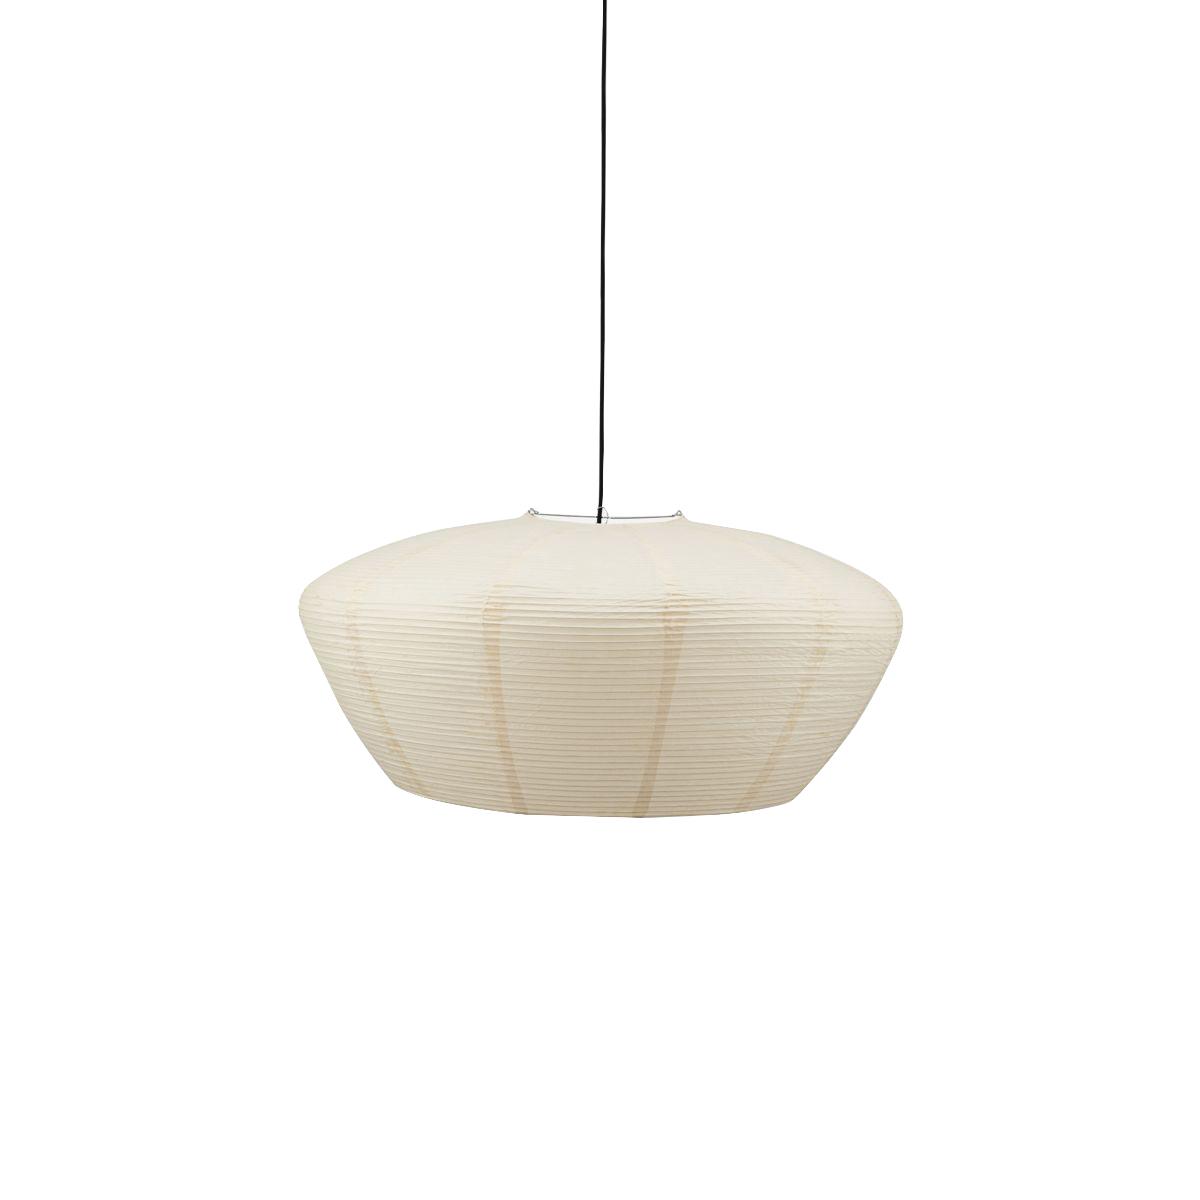 House Doctor - Bidar Lamp Shade Ø 81,5 cm - Sand (259370120)